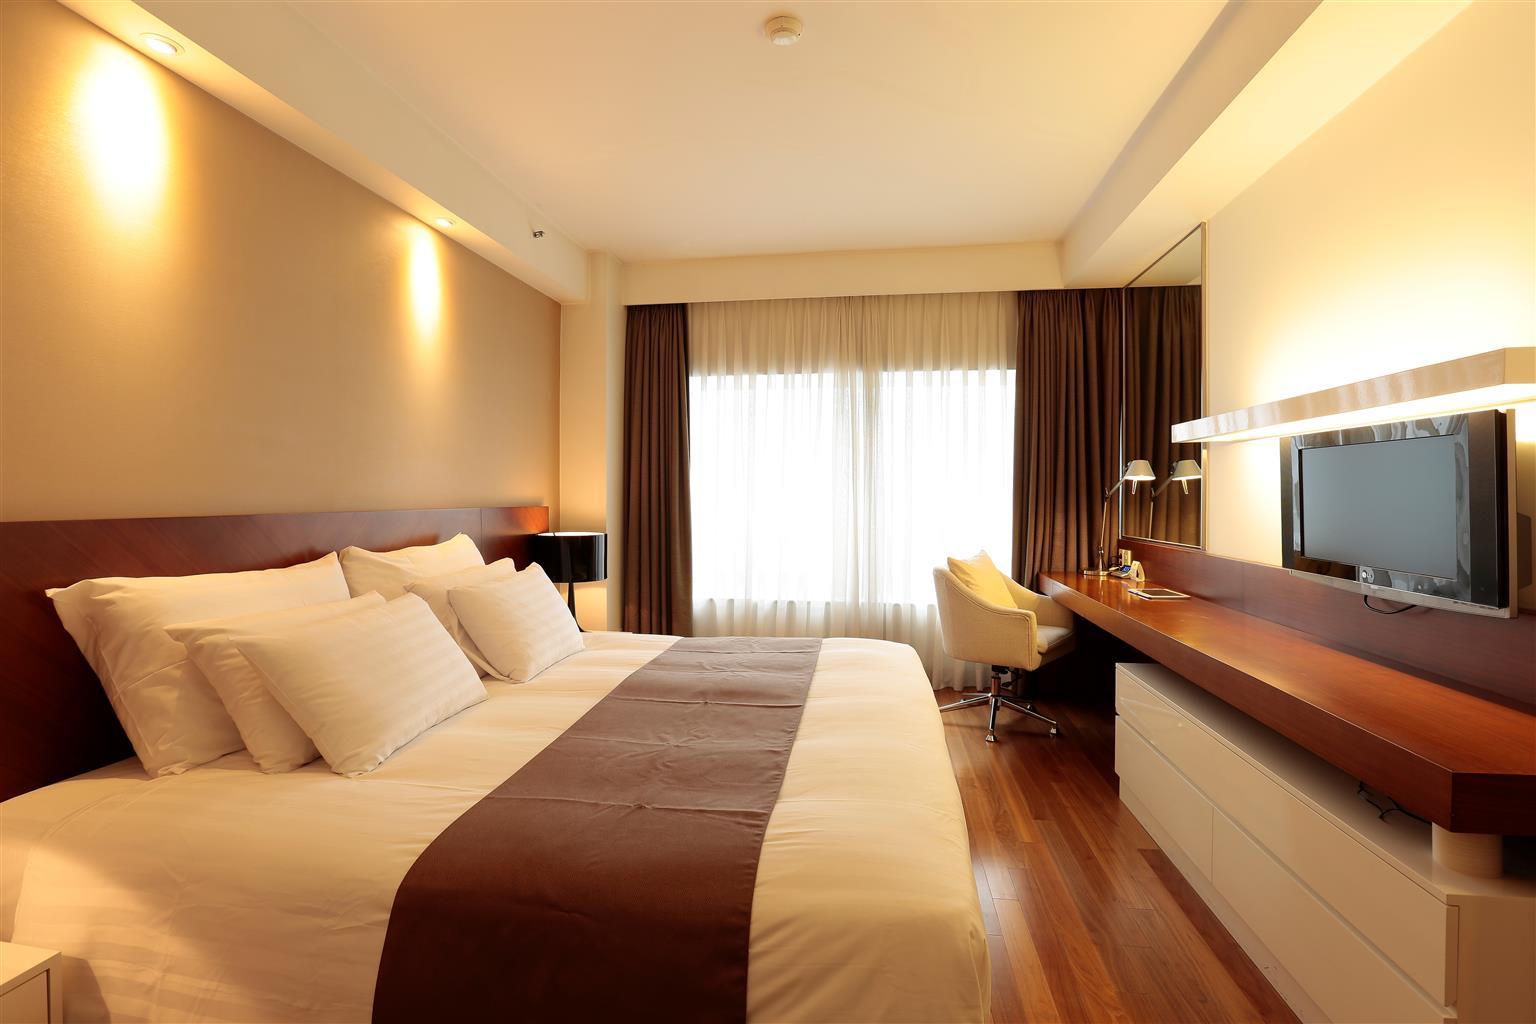 Book best western premier hotel kukdo seoul south korea hotels com - Book Now